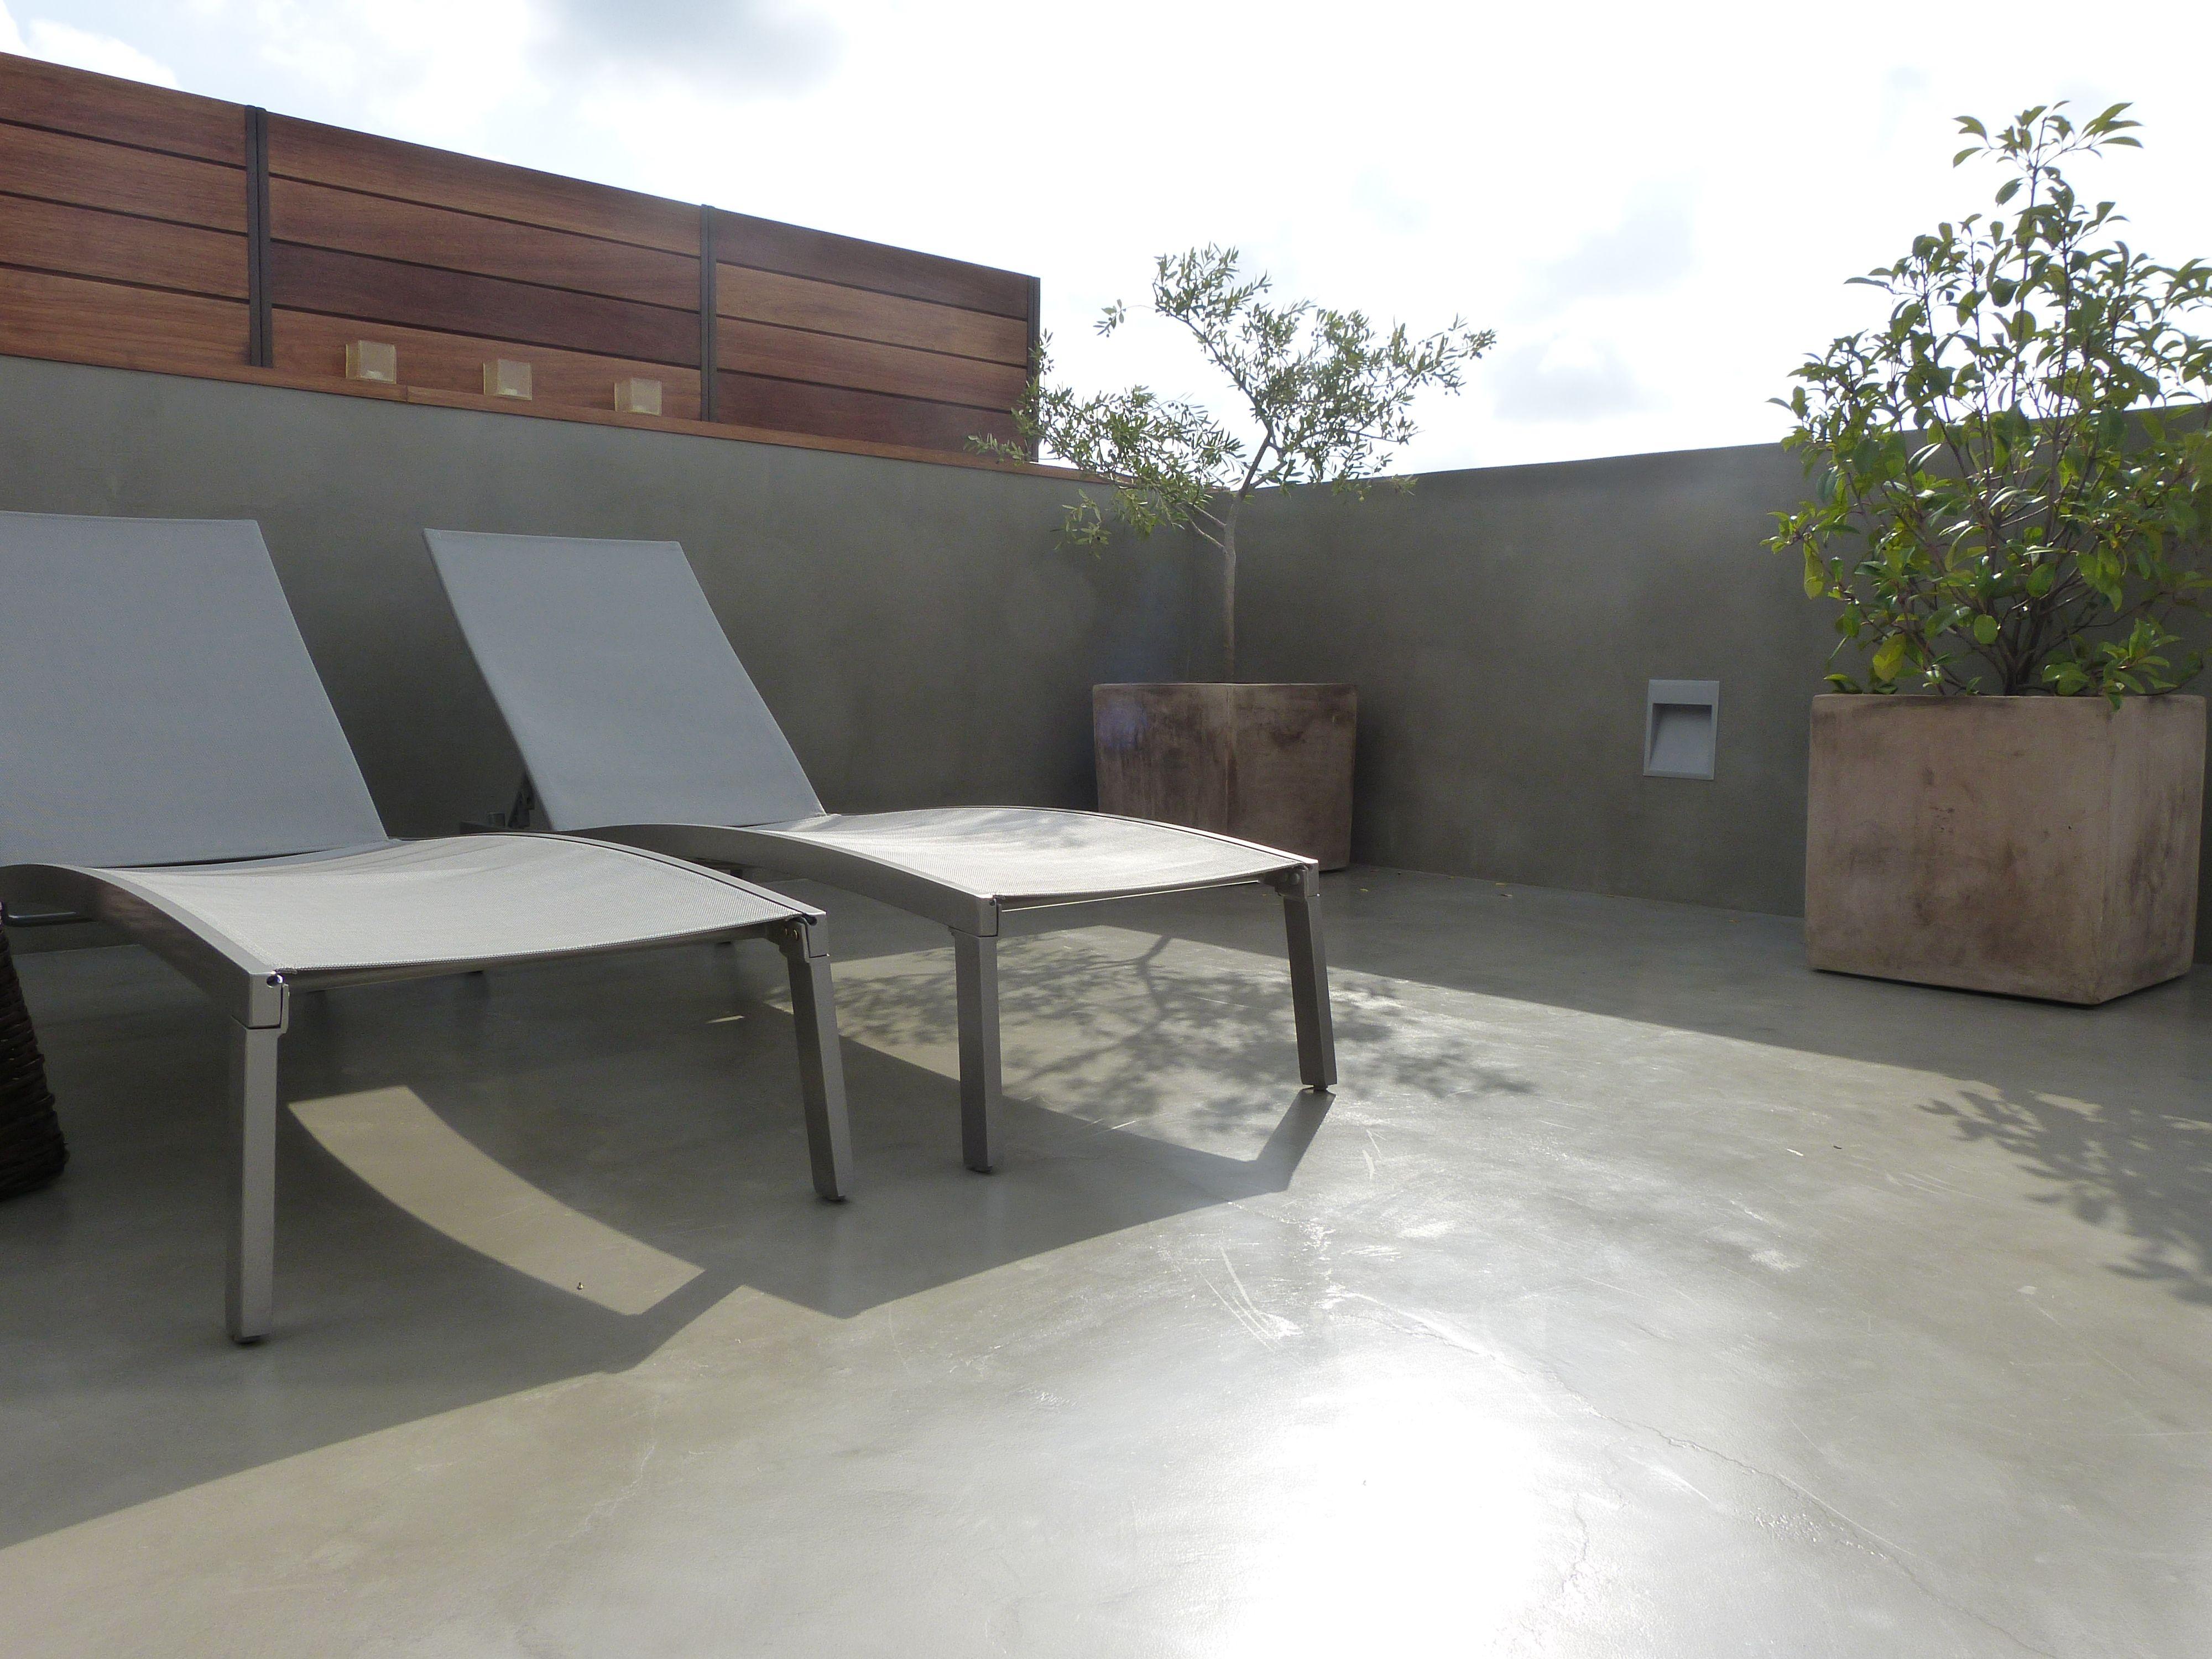 Terraza De Microcemento Gris Cemento Gana En Amplitud Y Modernidad Diseno De Terraza Microcemento Fachadas Casas Minimalistas